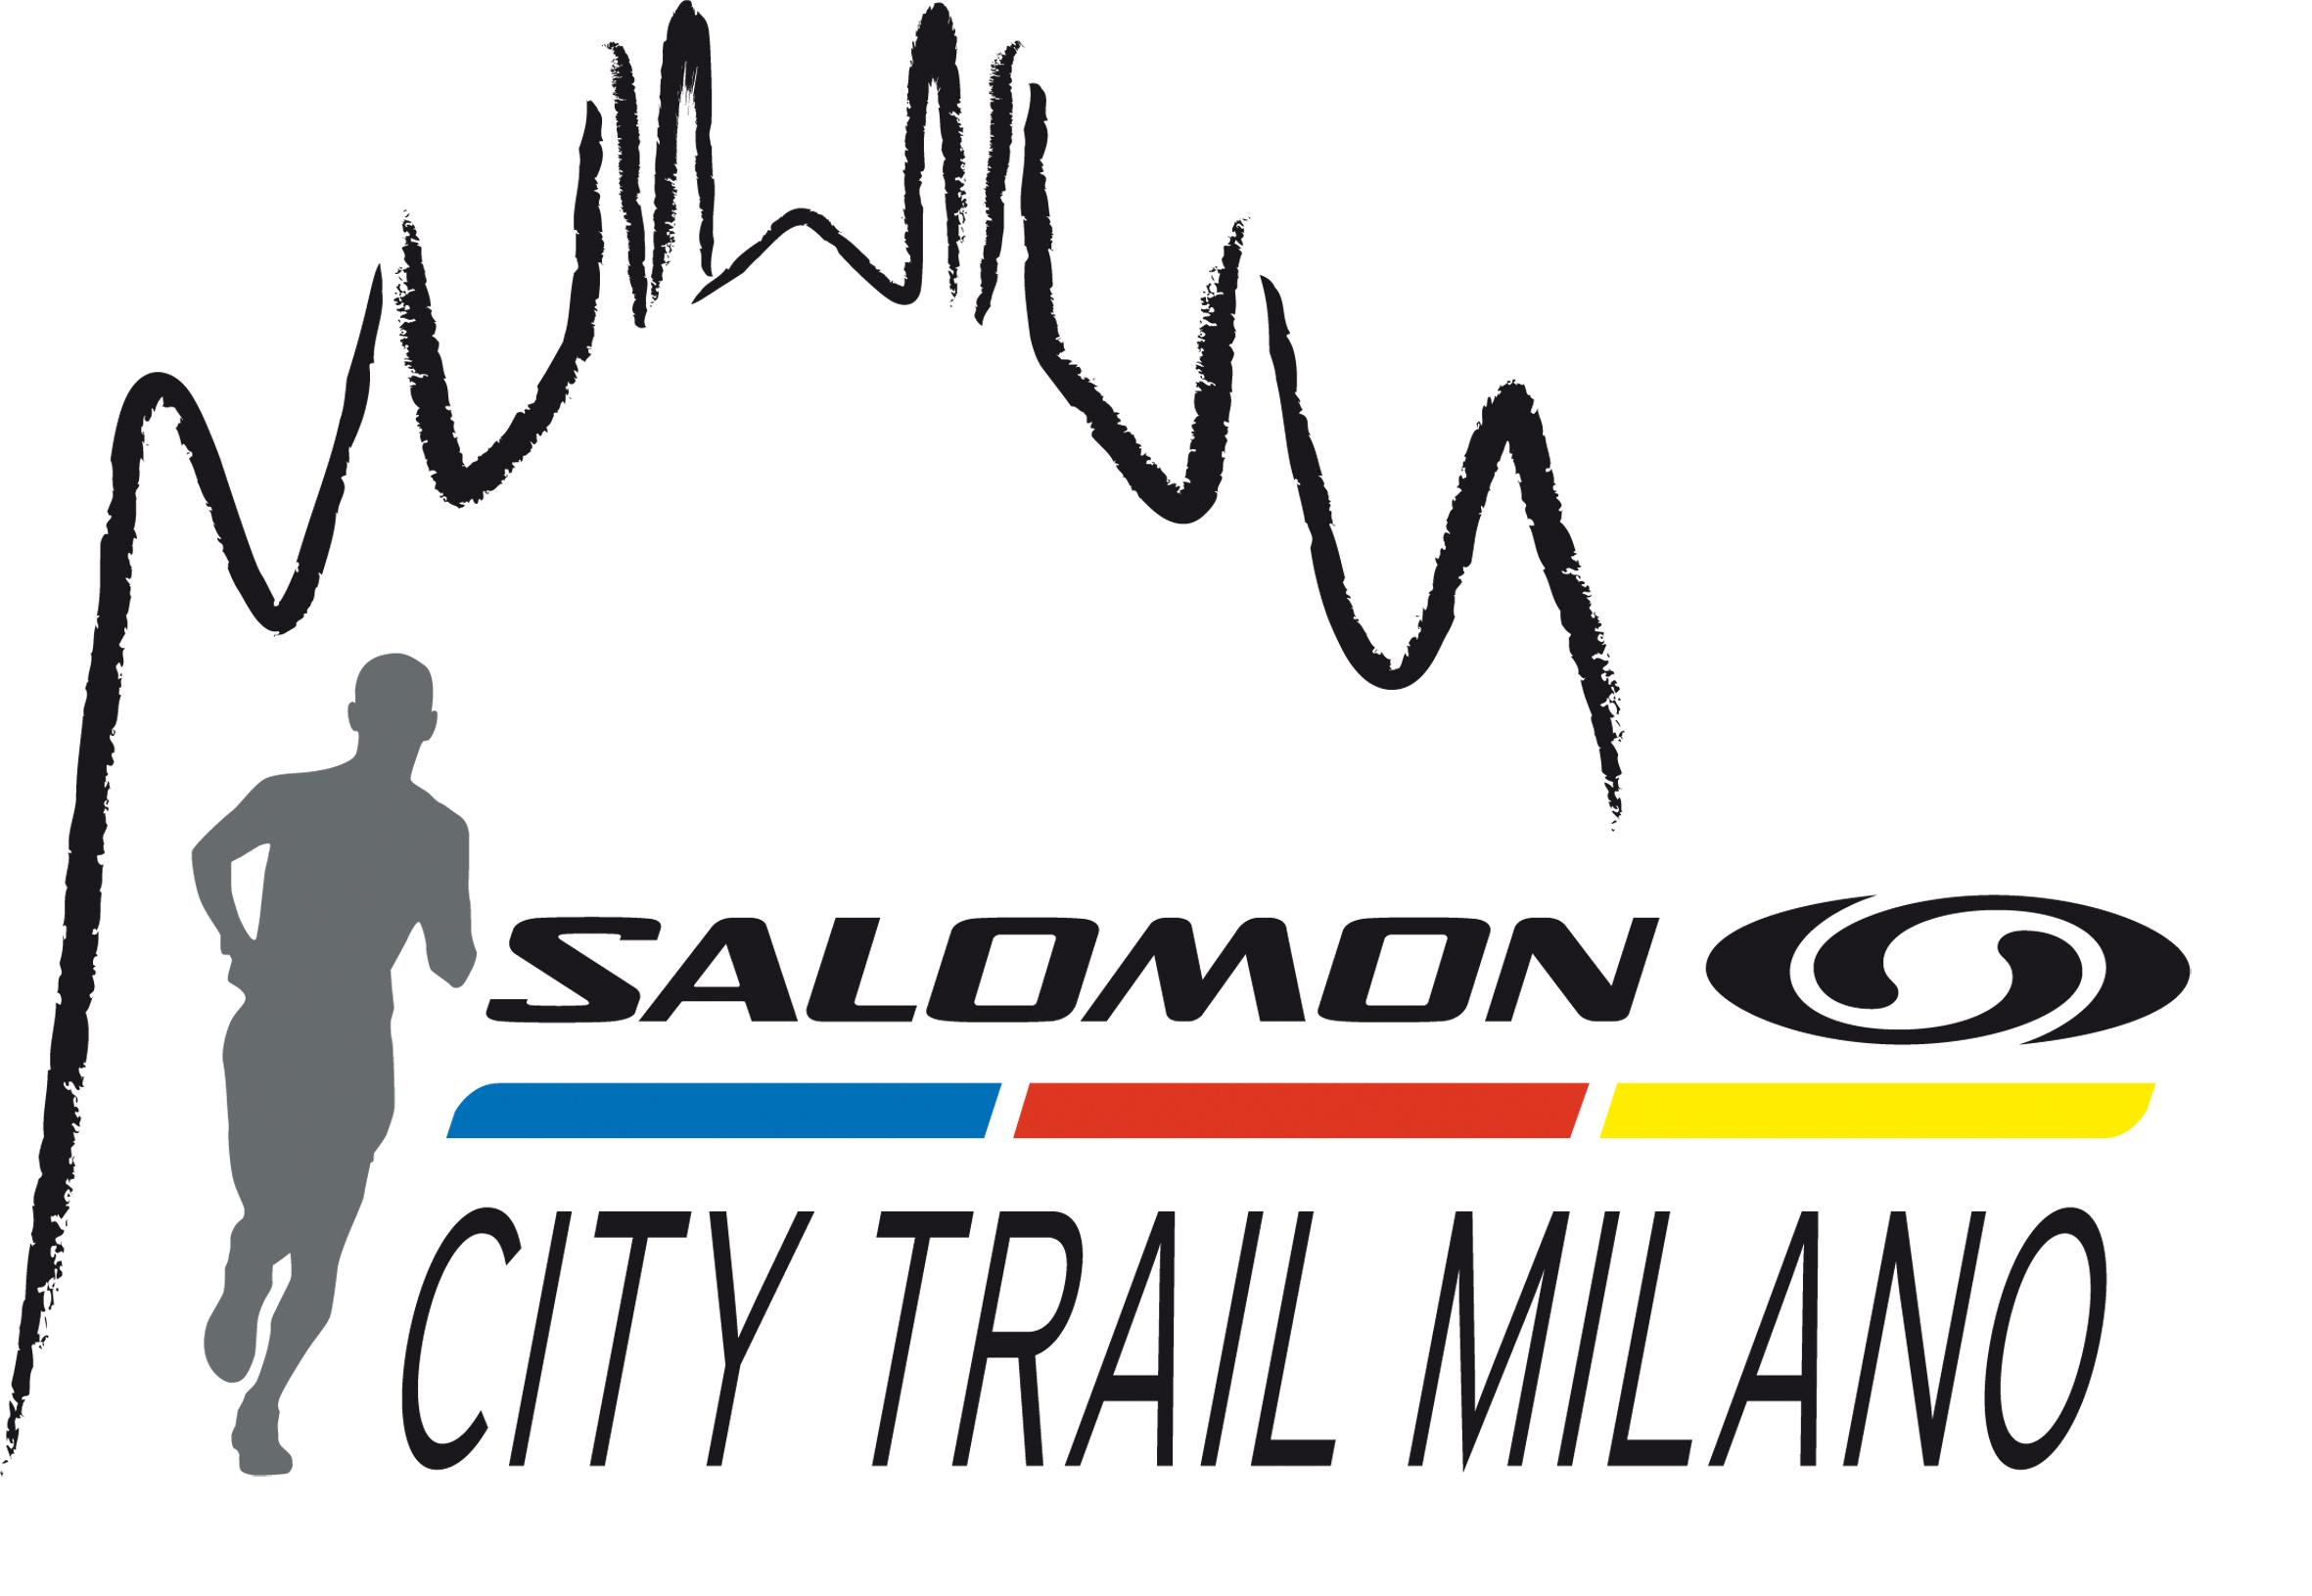 Salomon City Trail Milano 2011